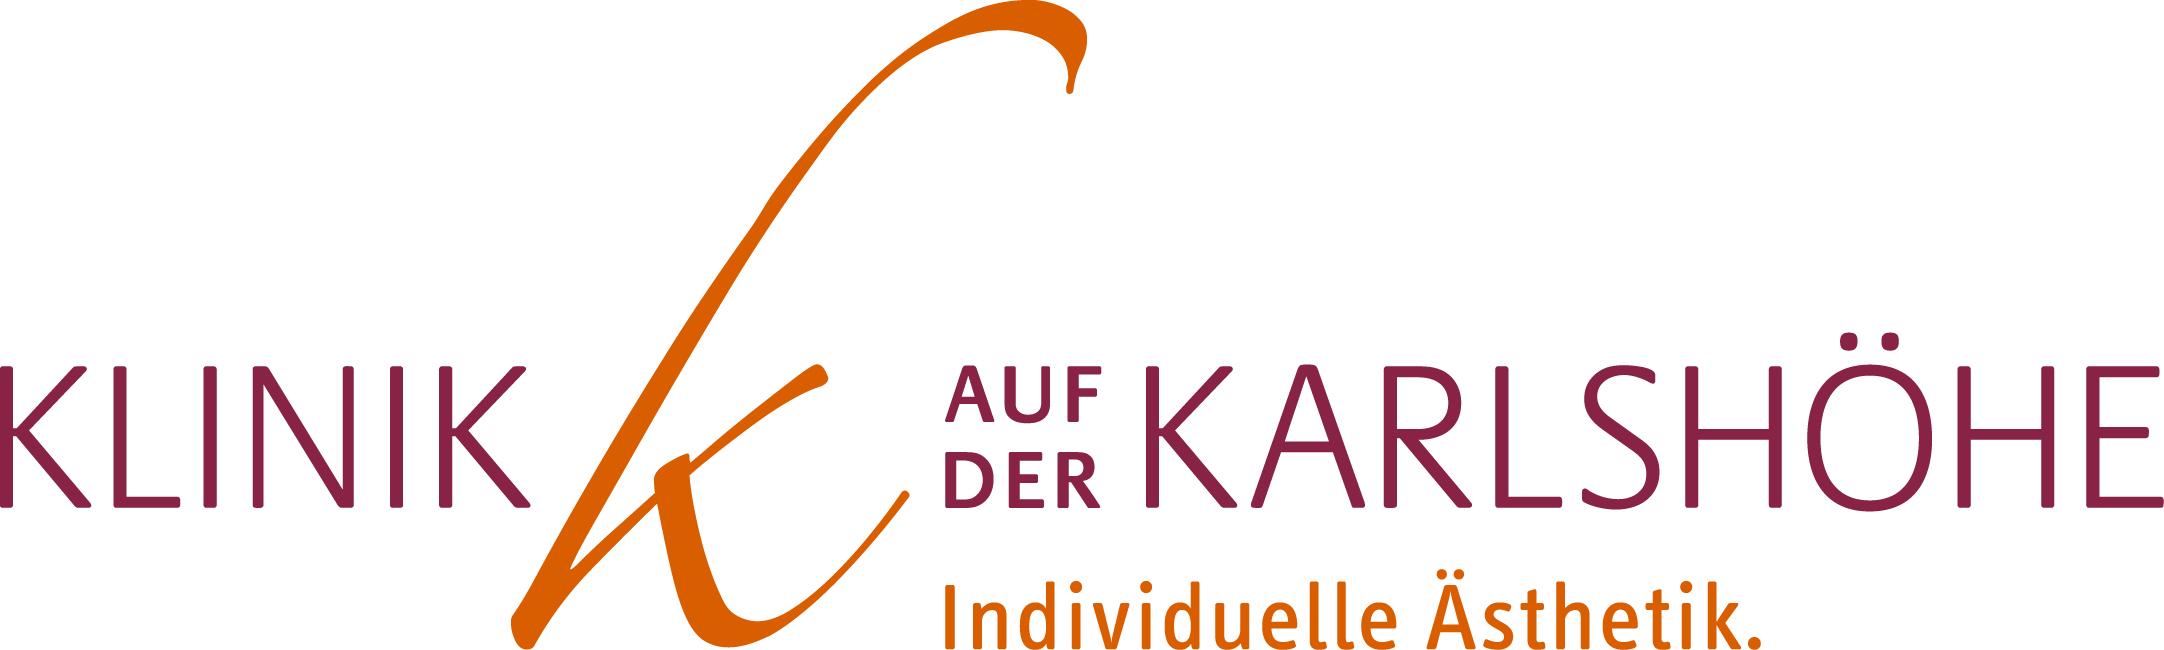 KLINIK AUF DER KARLSHÖHE Privatklinik Dr. med. Christian Fitz & Hermann-Frühwald